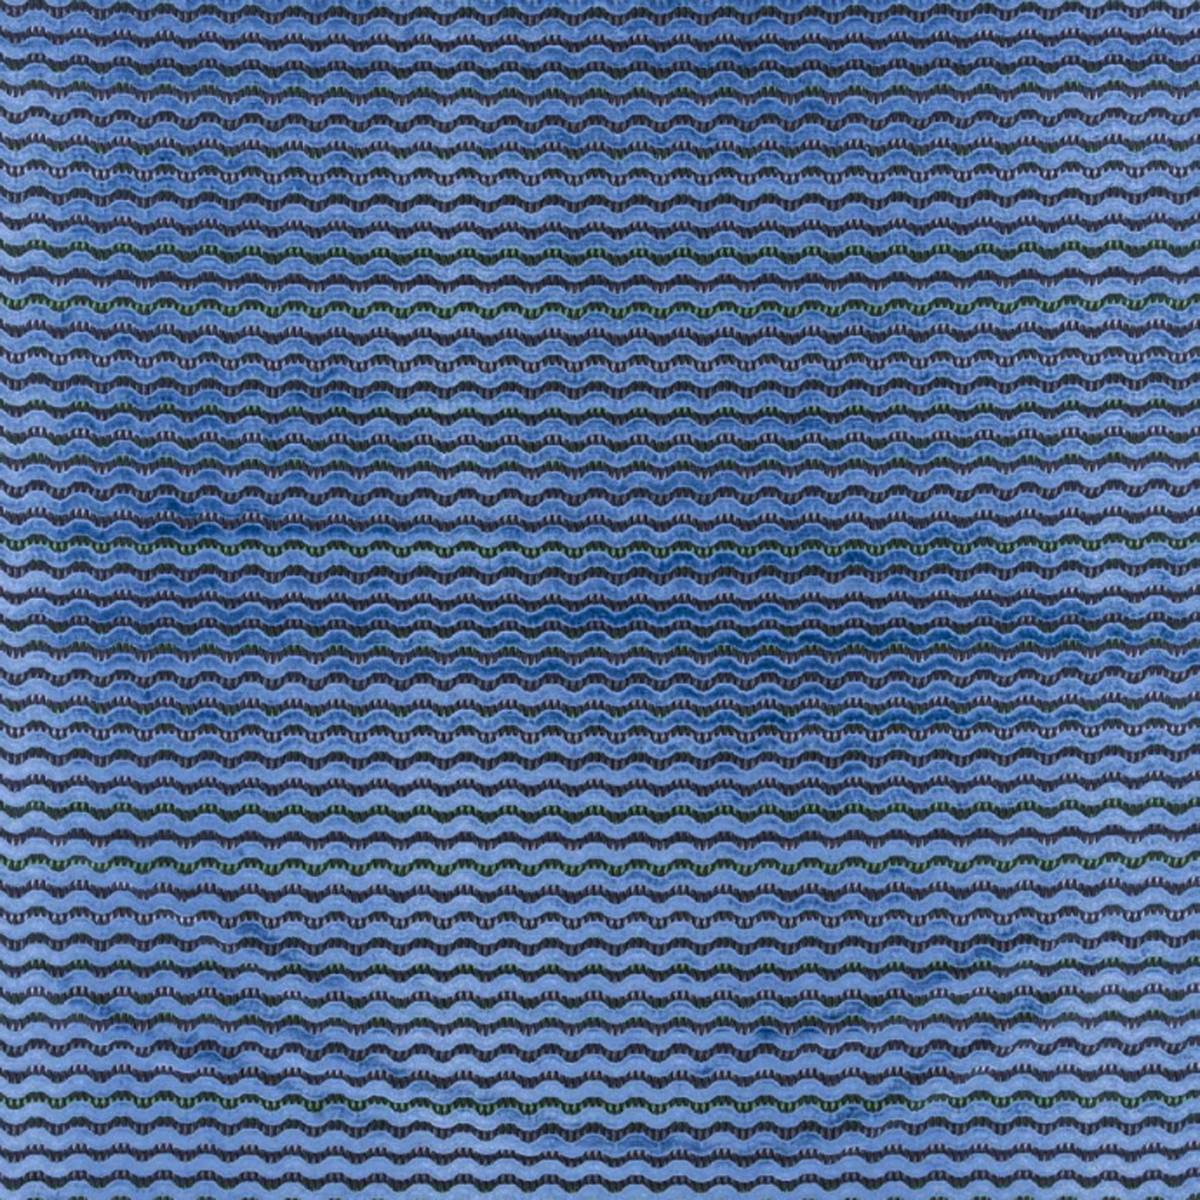 Murrine Fabric Delft F2661 02 Designers Guild